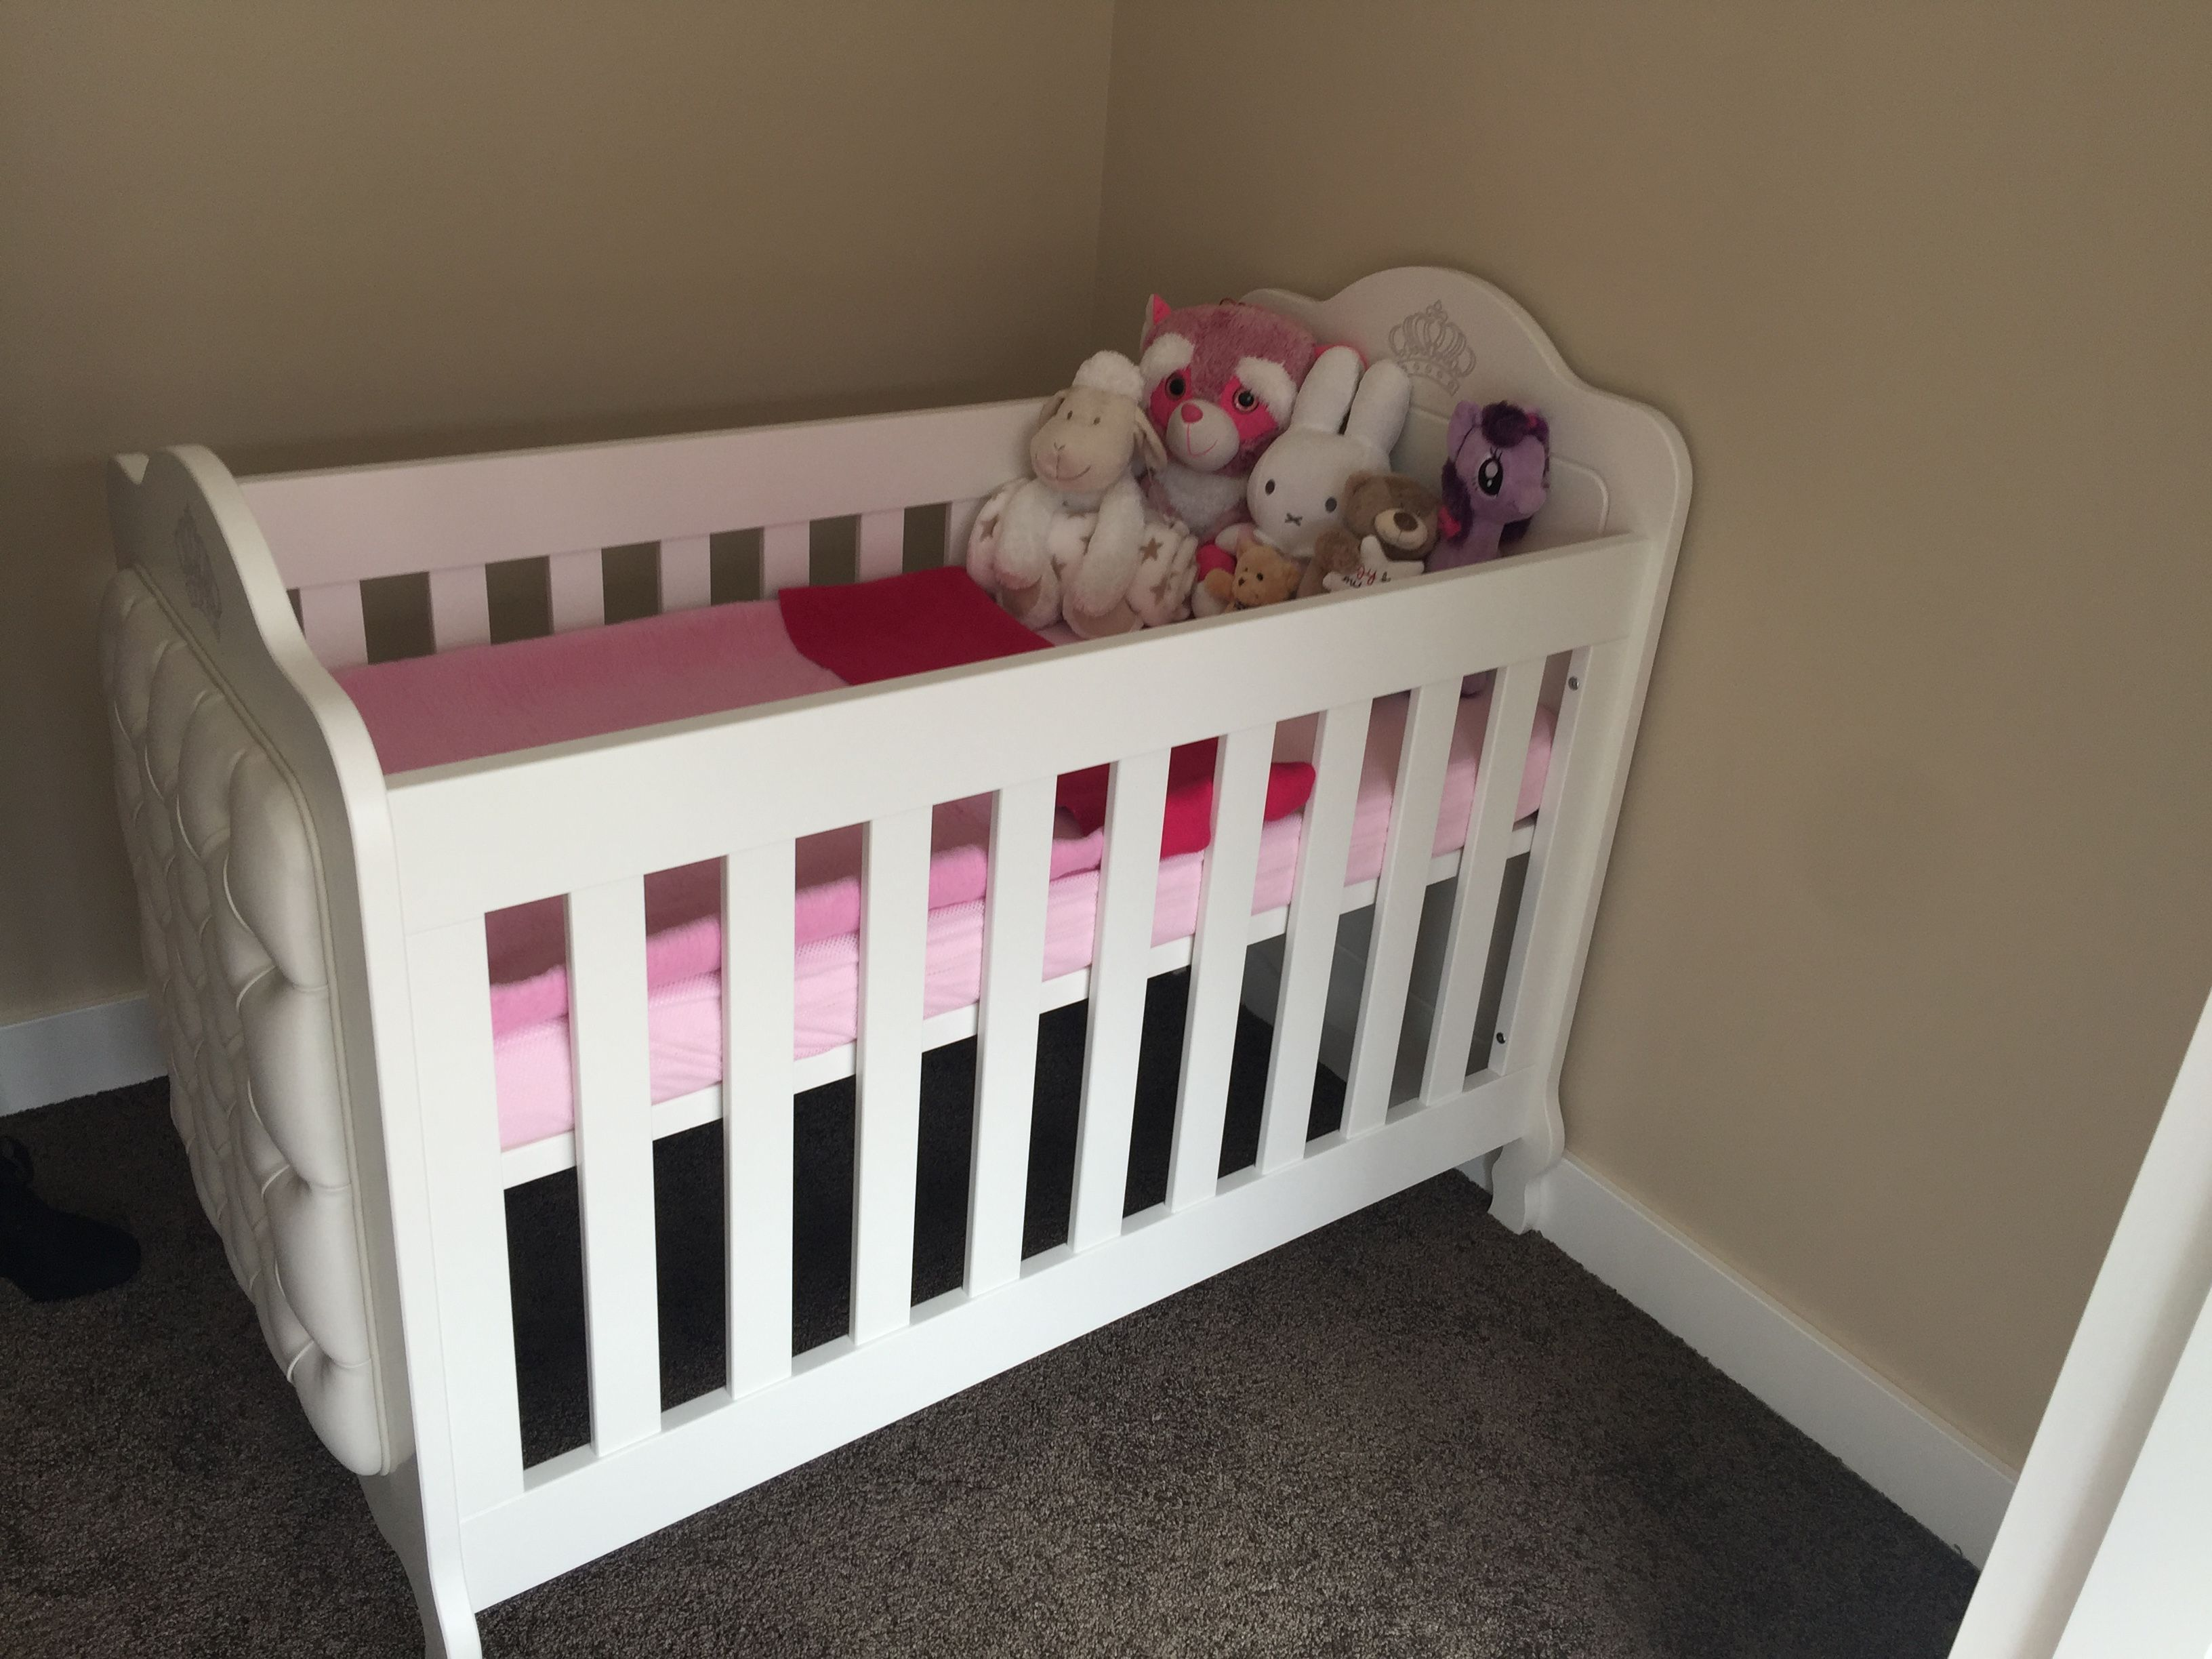 Babykamer Bopita Ideeen : Onze babykamer van bopita genaamd babykamer diva stuff